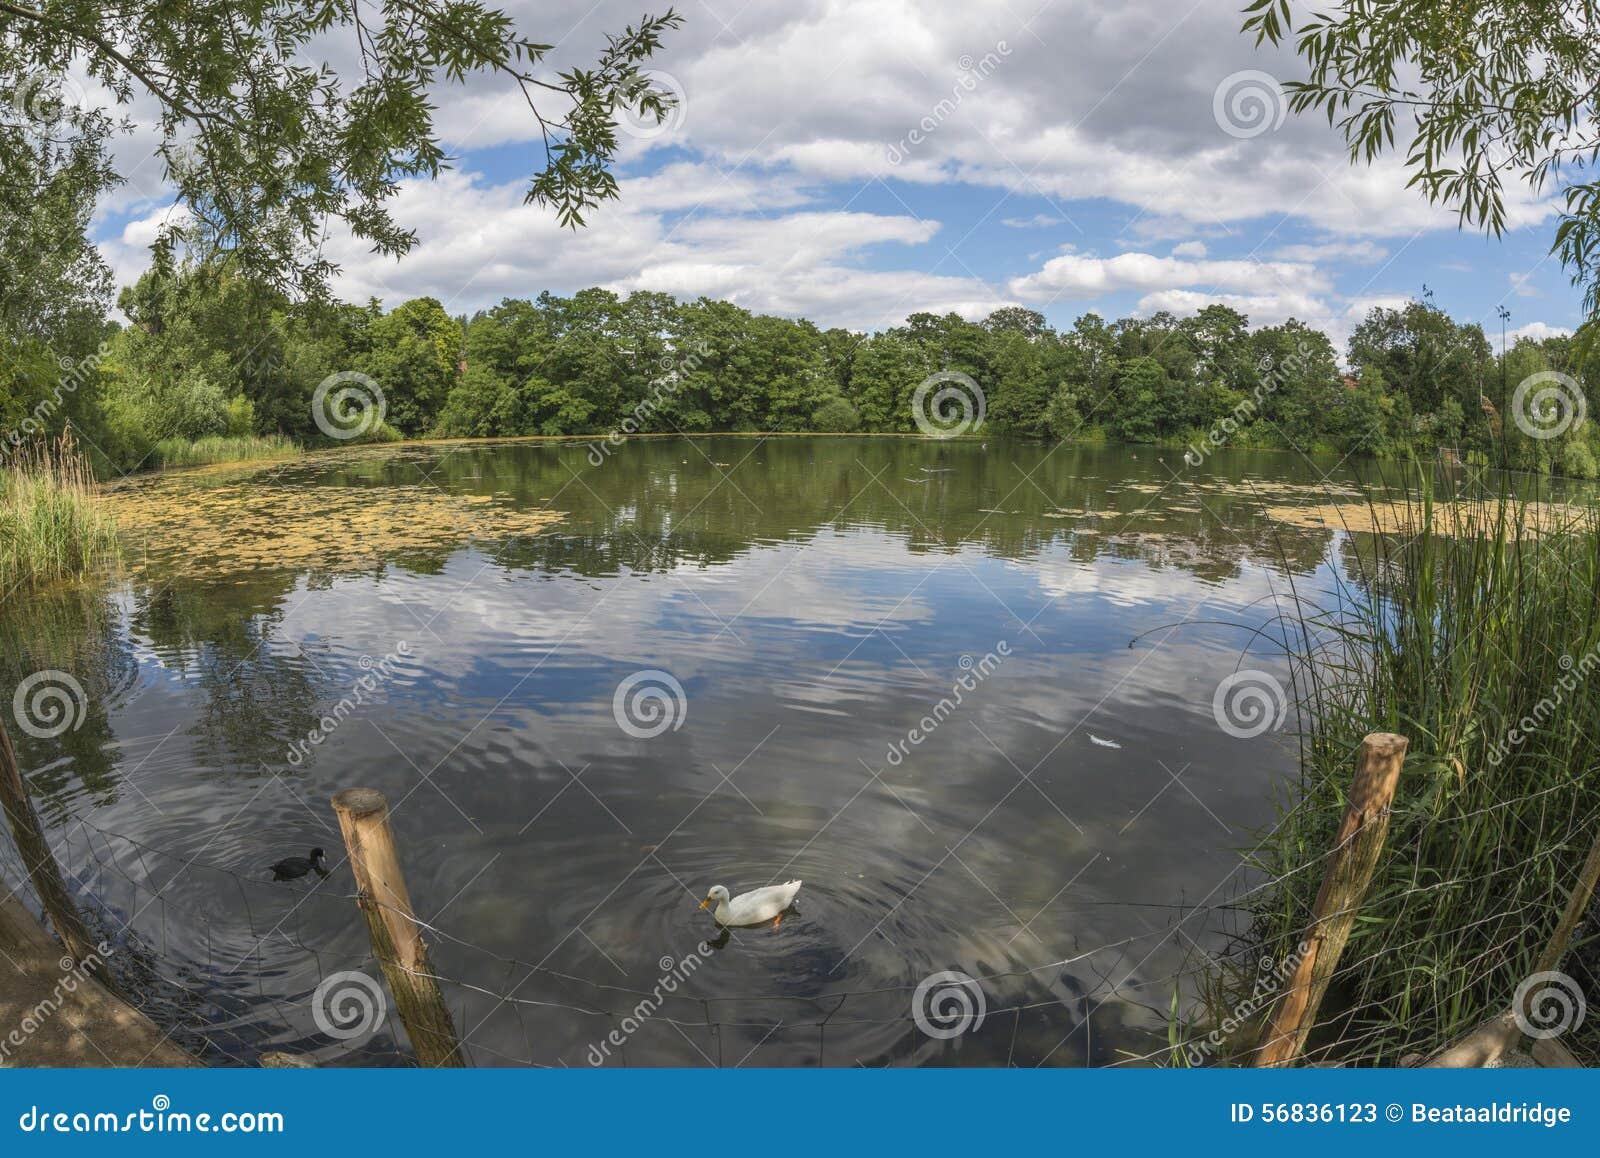 Hampstead heath london stock photo for Pond dealers